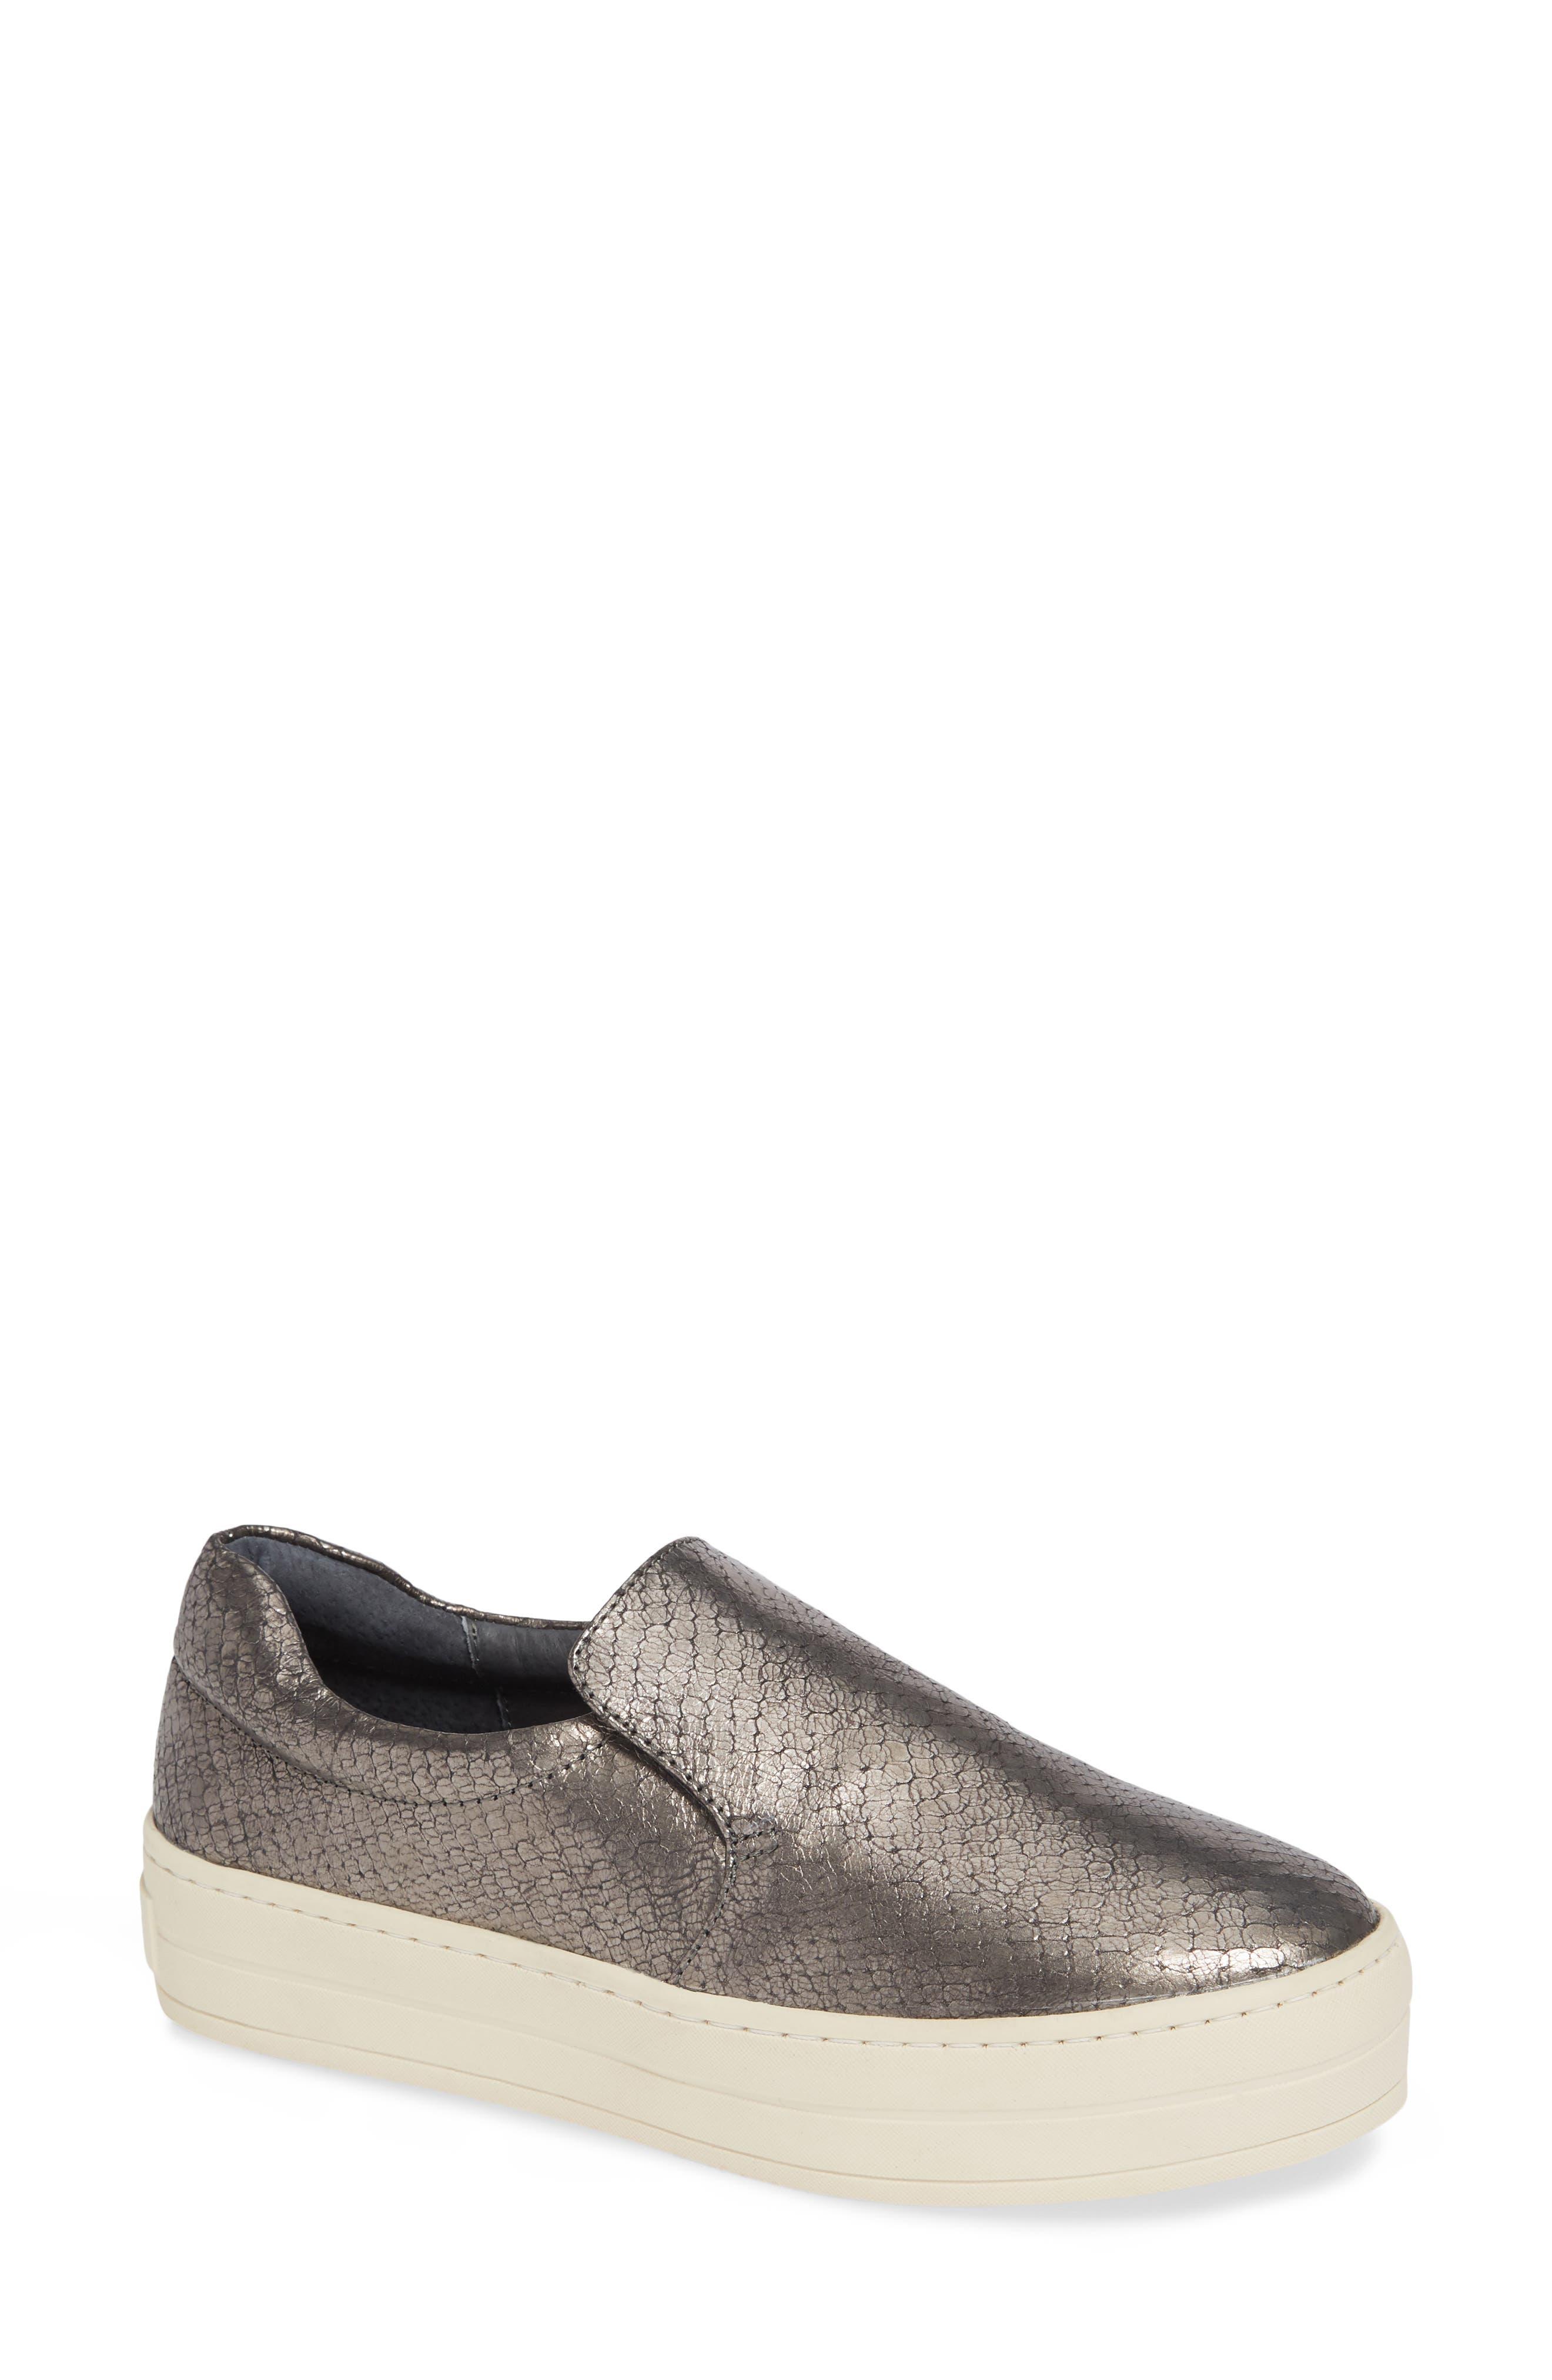 Harry Slip-On Sneaker in Pewter Embossed Leather